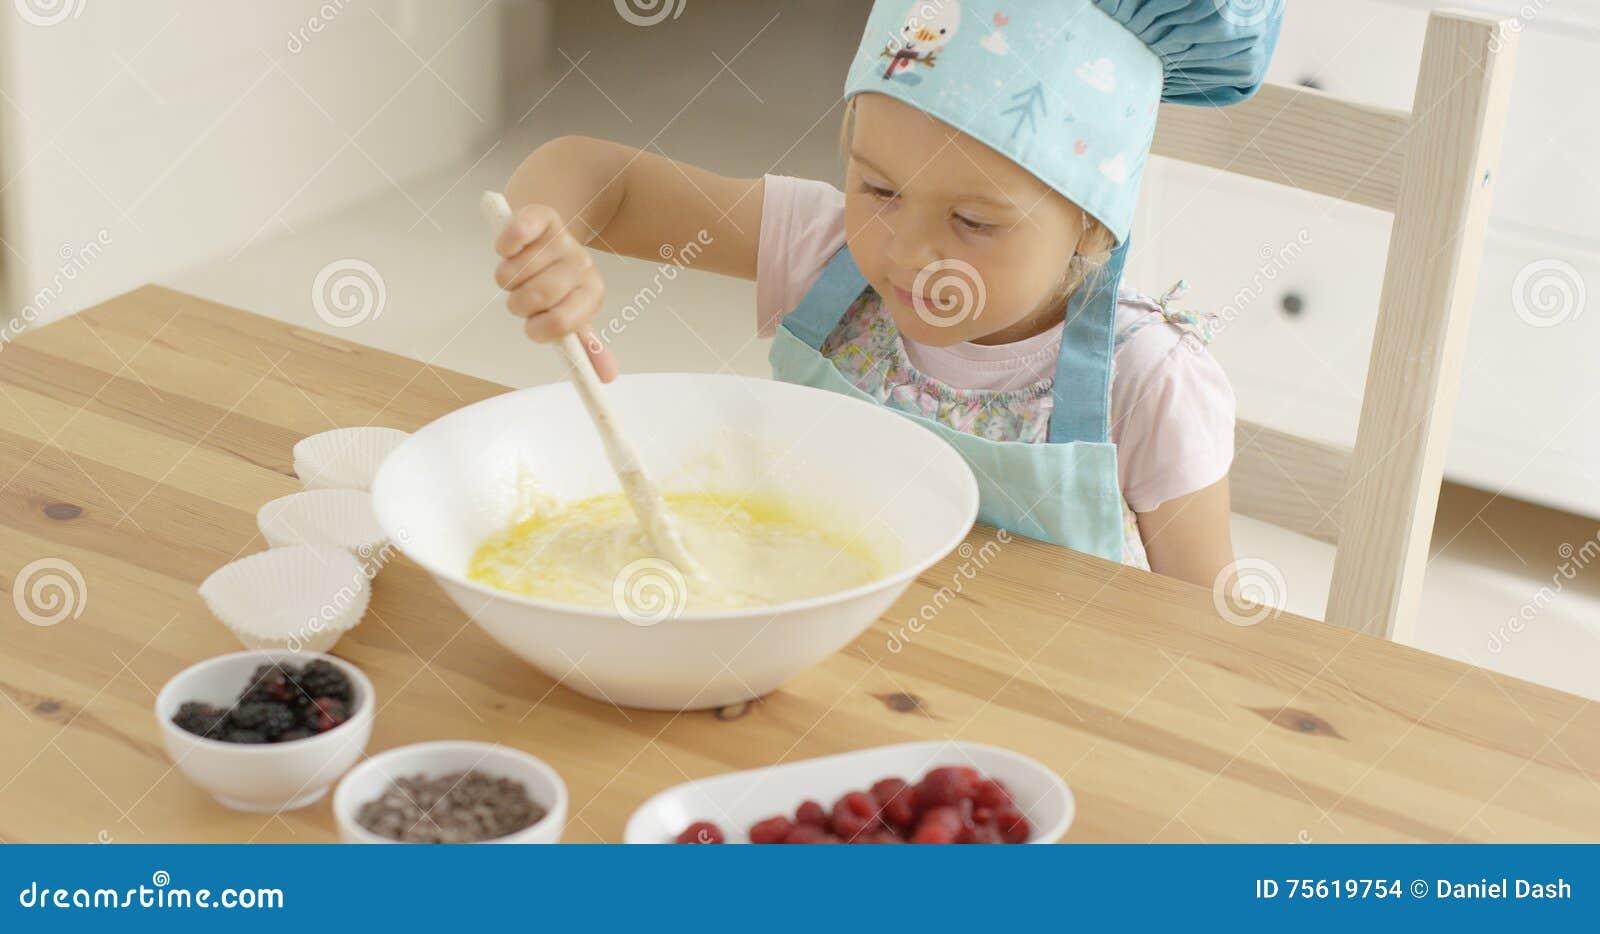 Adorable toddler at mixing bowl